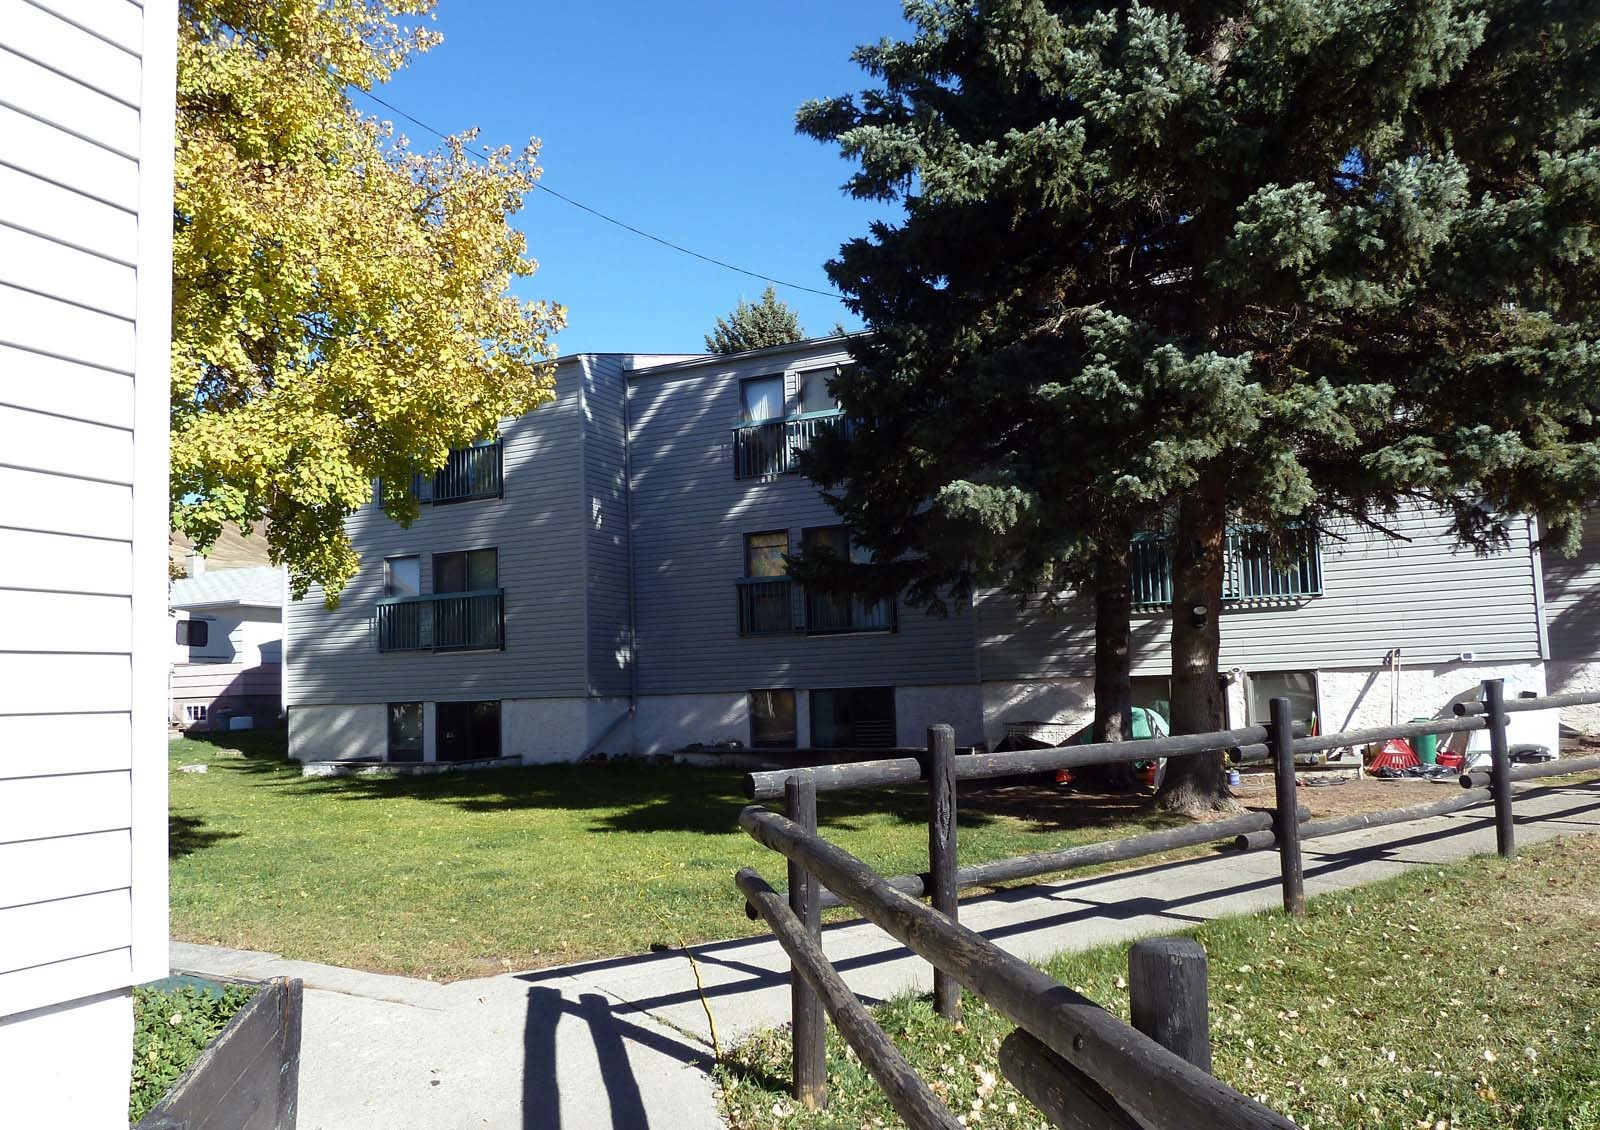 205 Ross Avenue, Cochrane, AB - $925